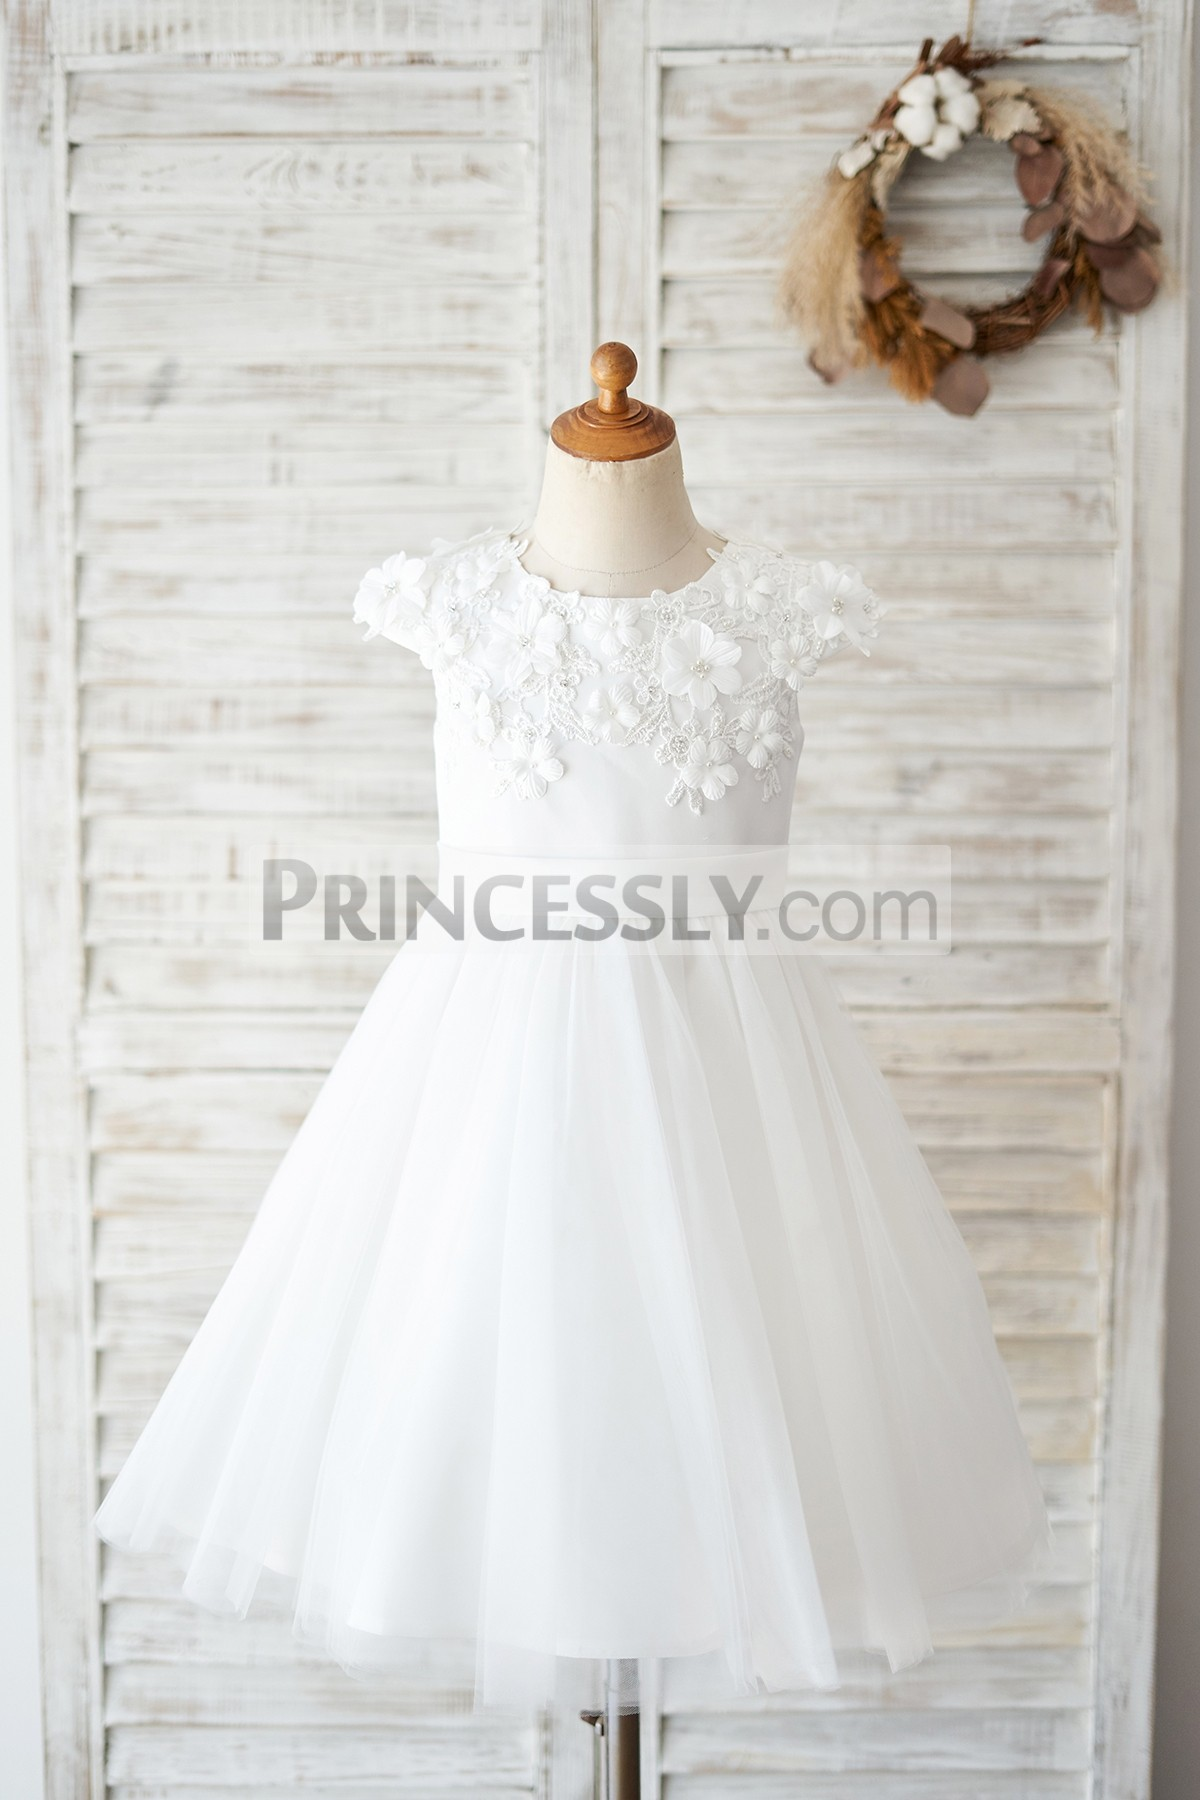 Princessly.com-K1004039 Ivory Lace Tulle Cap Sleeves Flowers Wedding Flower Girl Dress-31